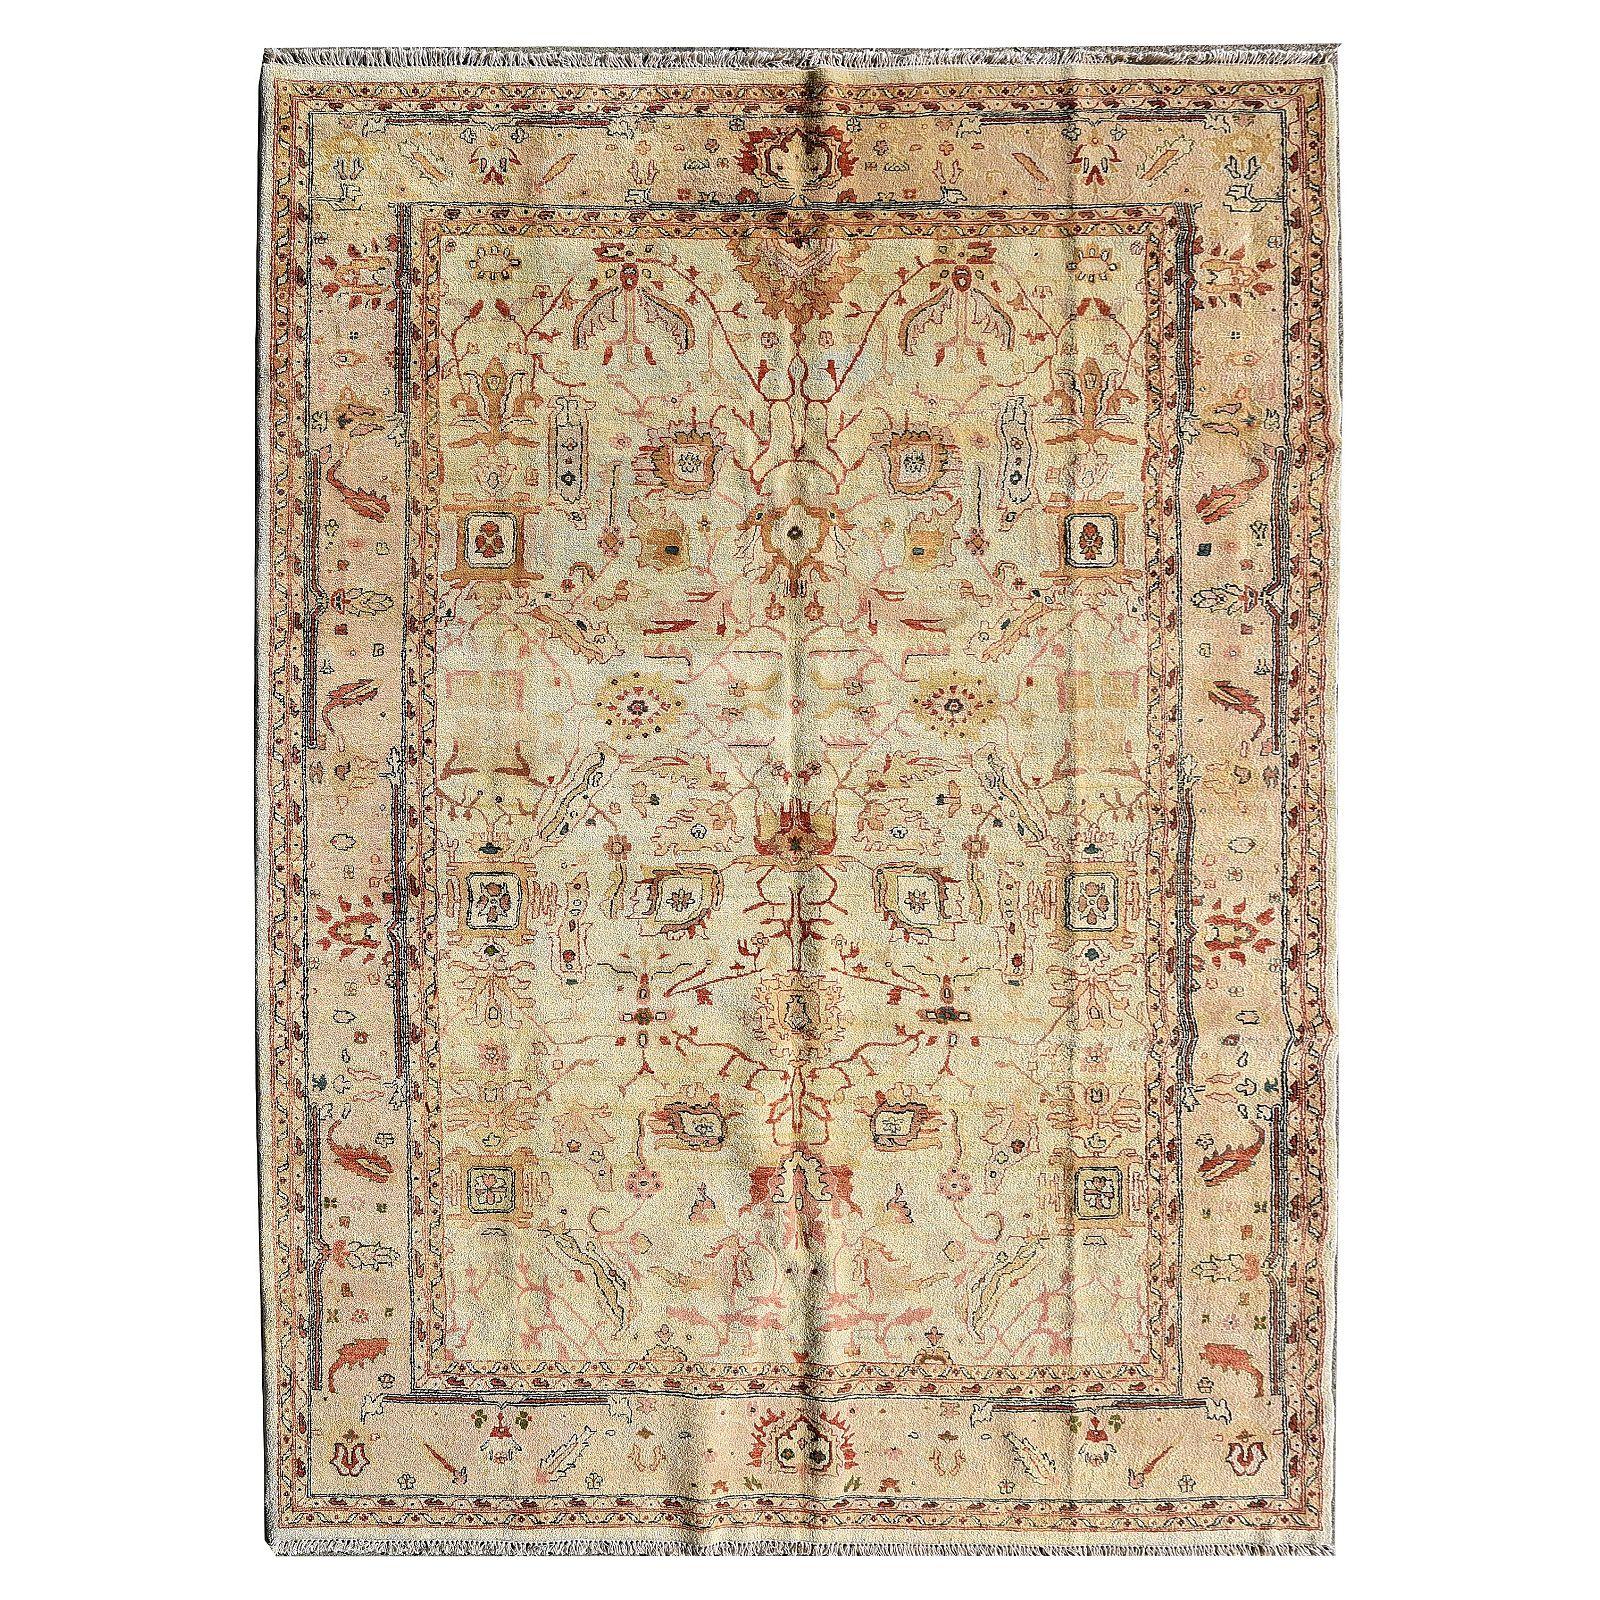 Persian Wool Carpet.